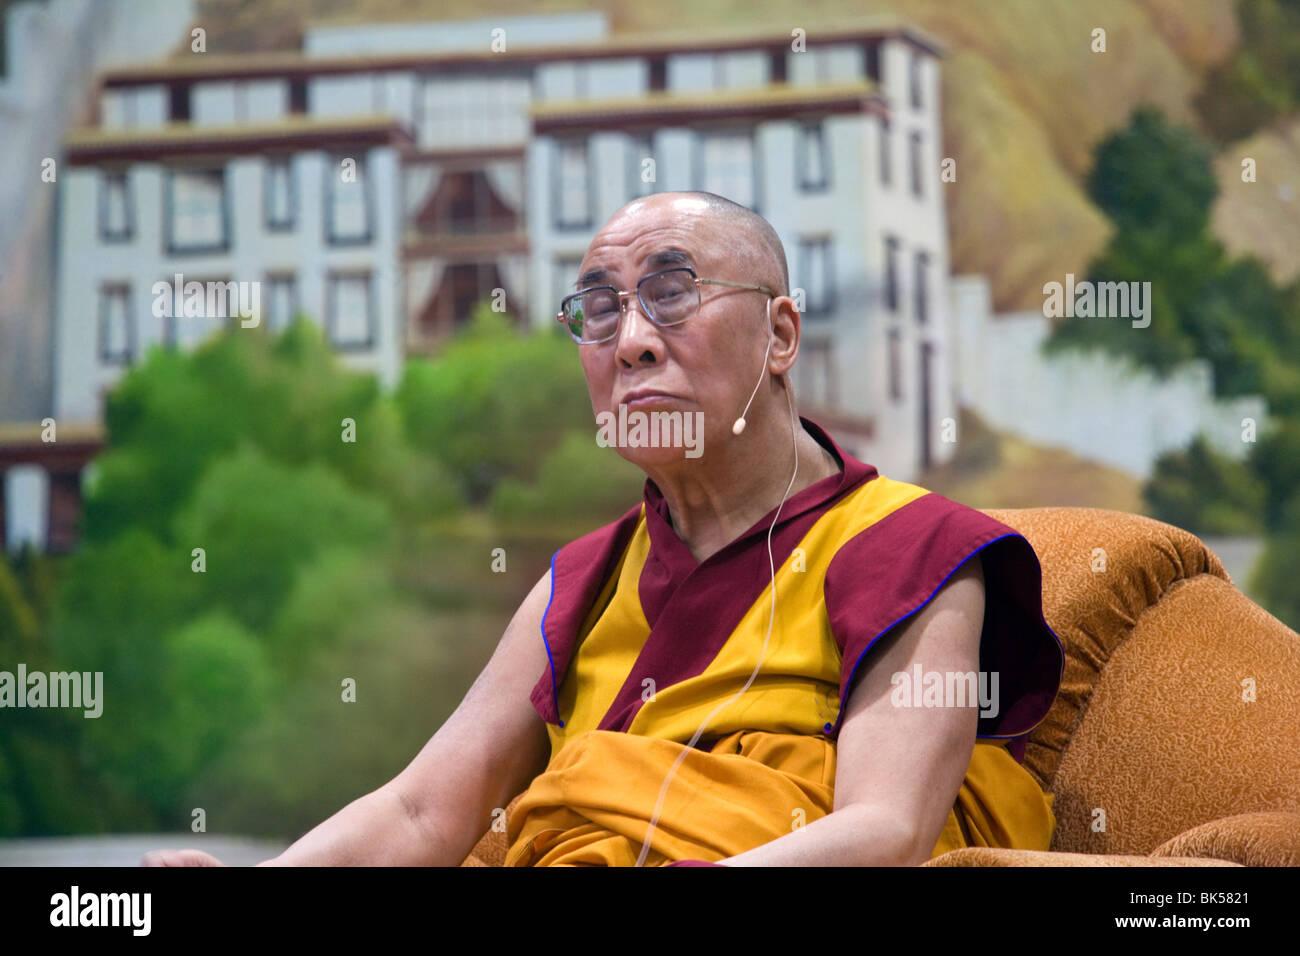 His Holiness the 14th Dalai Lama giving teachings at Tibetan Children's Village in Dharamsala, India - Stock Image